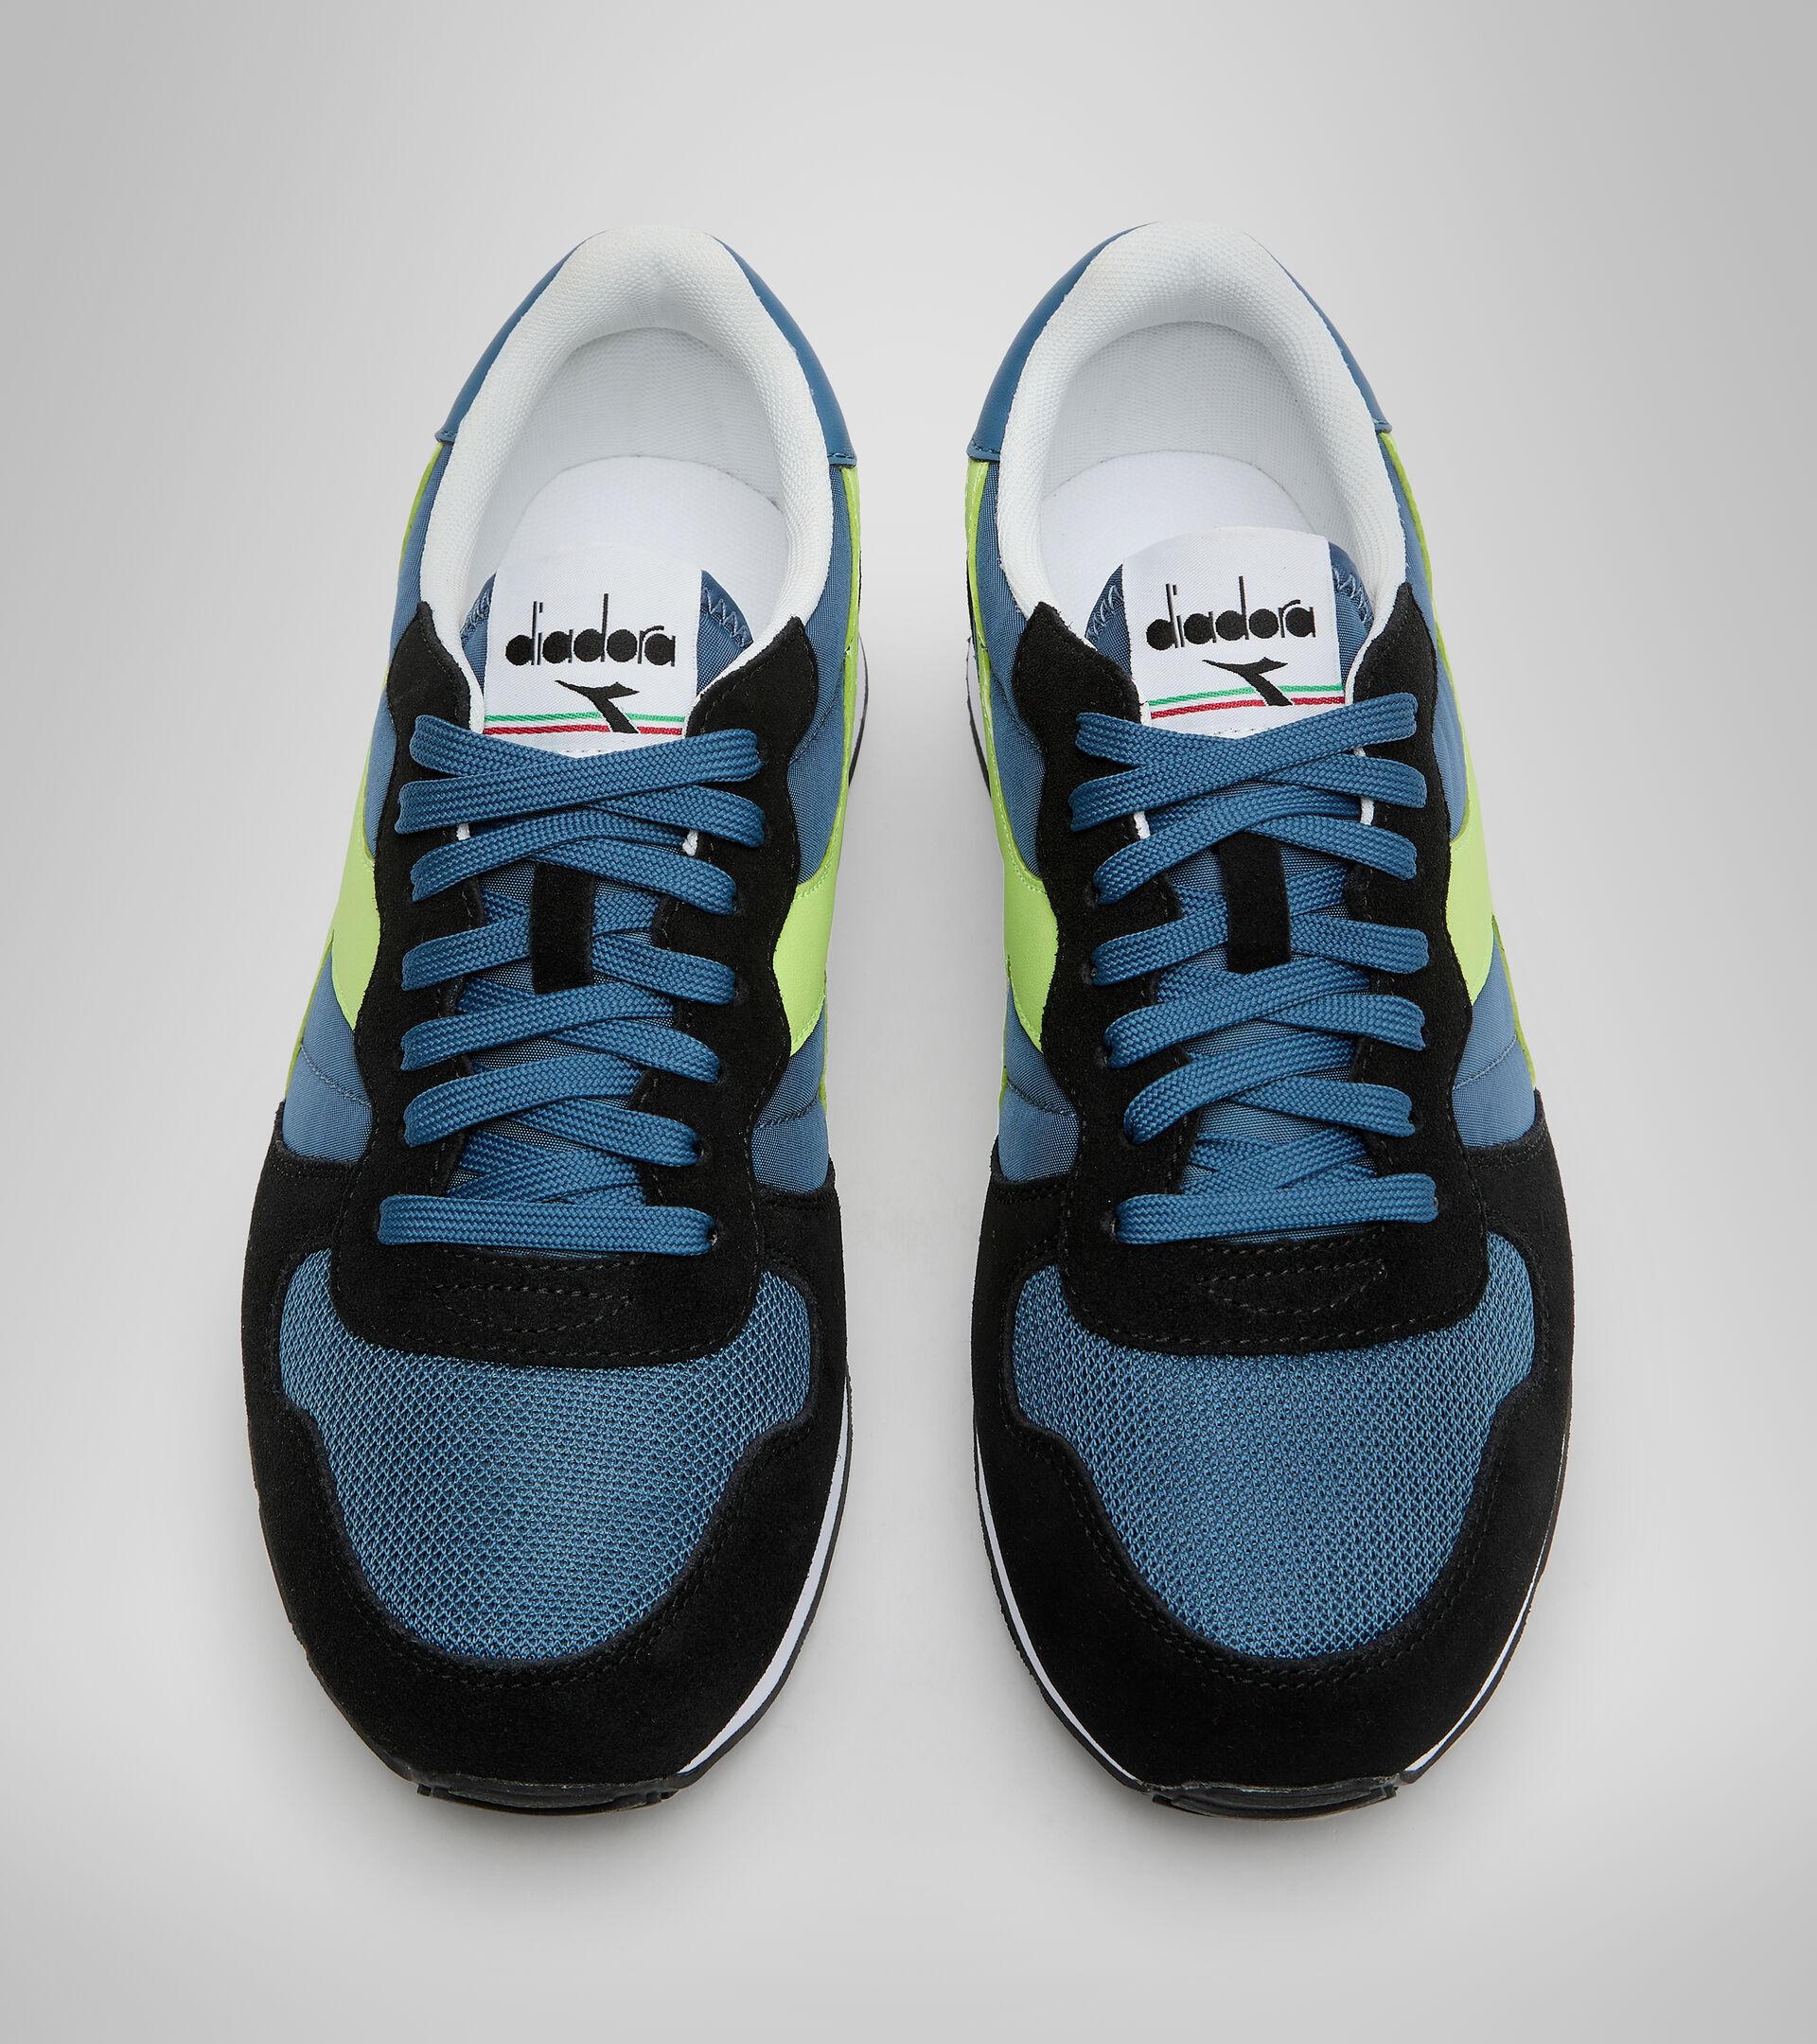 Footwear Sportswear UNISEX CAMARO MEDIONOCHE/NEGRO Diadora